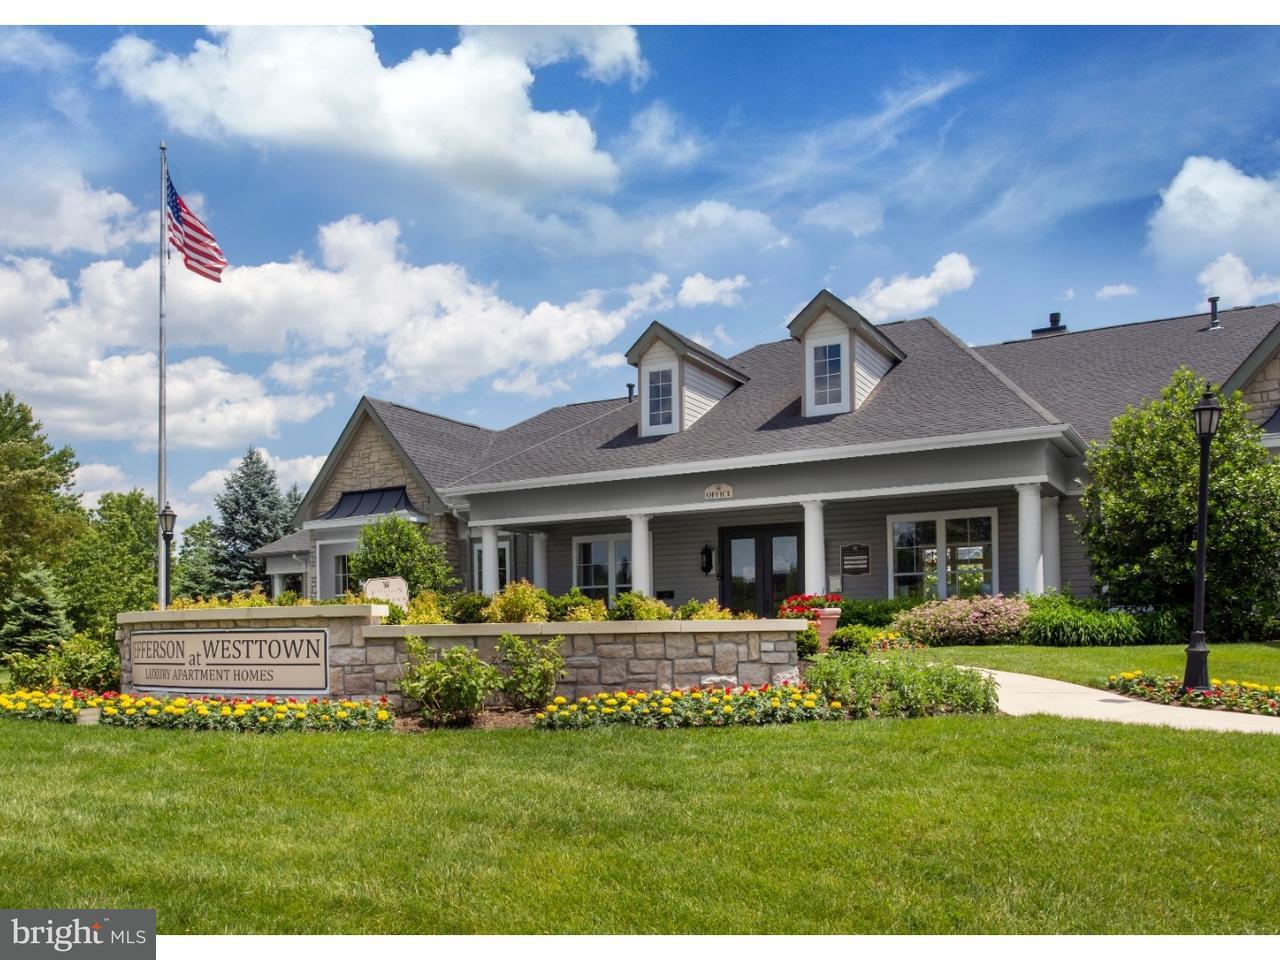 Casa Unifamiliar por un Alquiler en 1000 SKILES BLVD #1821 West Chester, Pennsylvania 19382 Estados Unidos